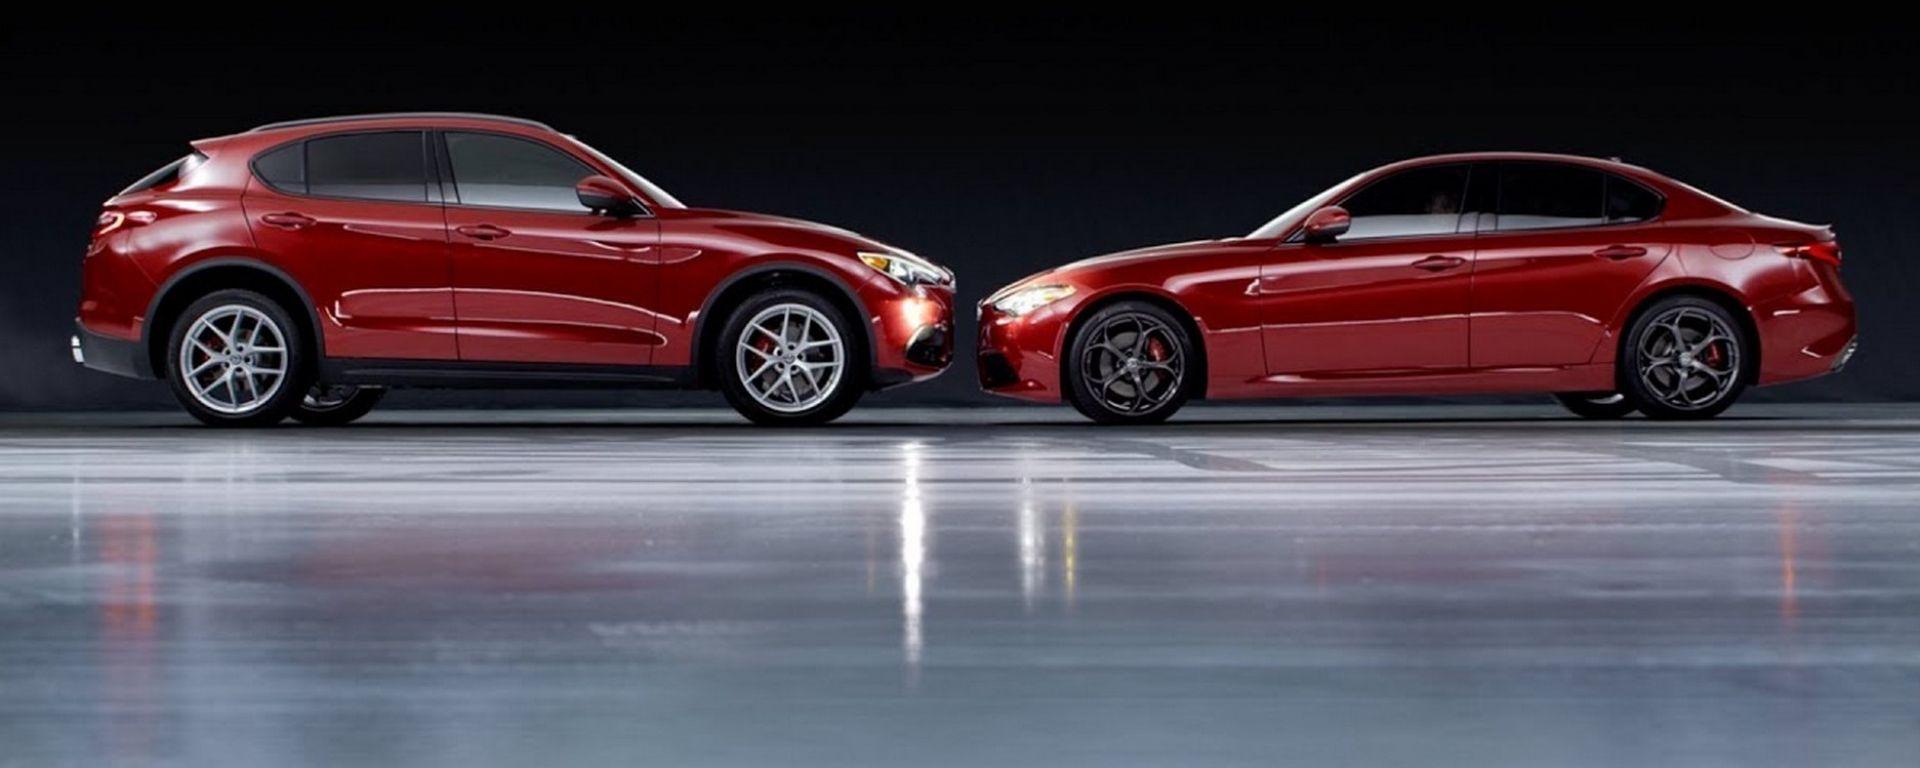 Alfa Romeo Giulia e Stelvio, più convenienti grazie a Bonus Impresa